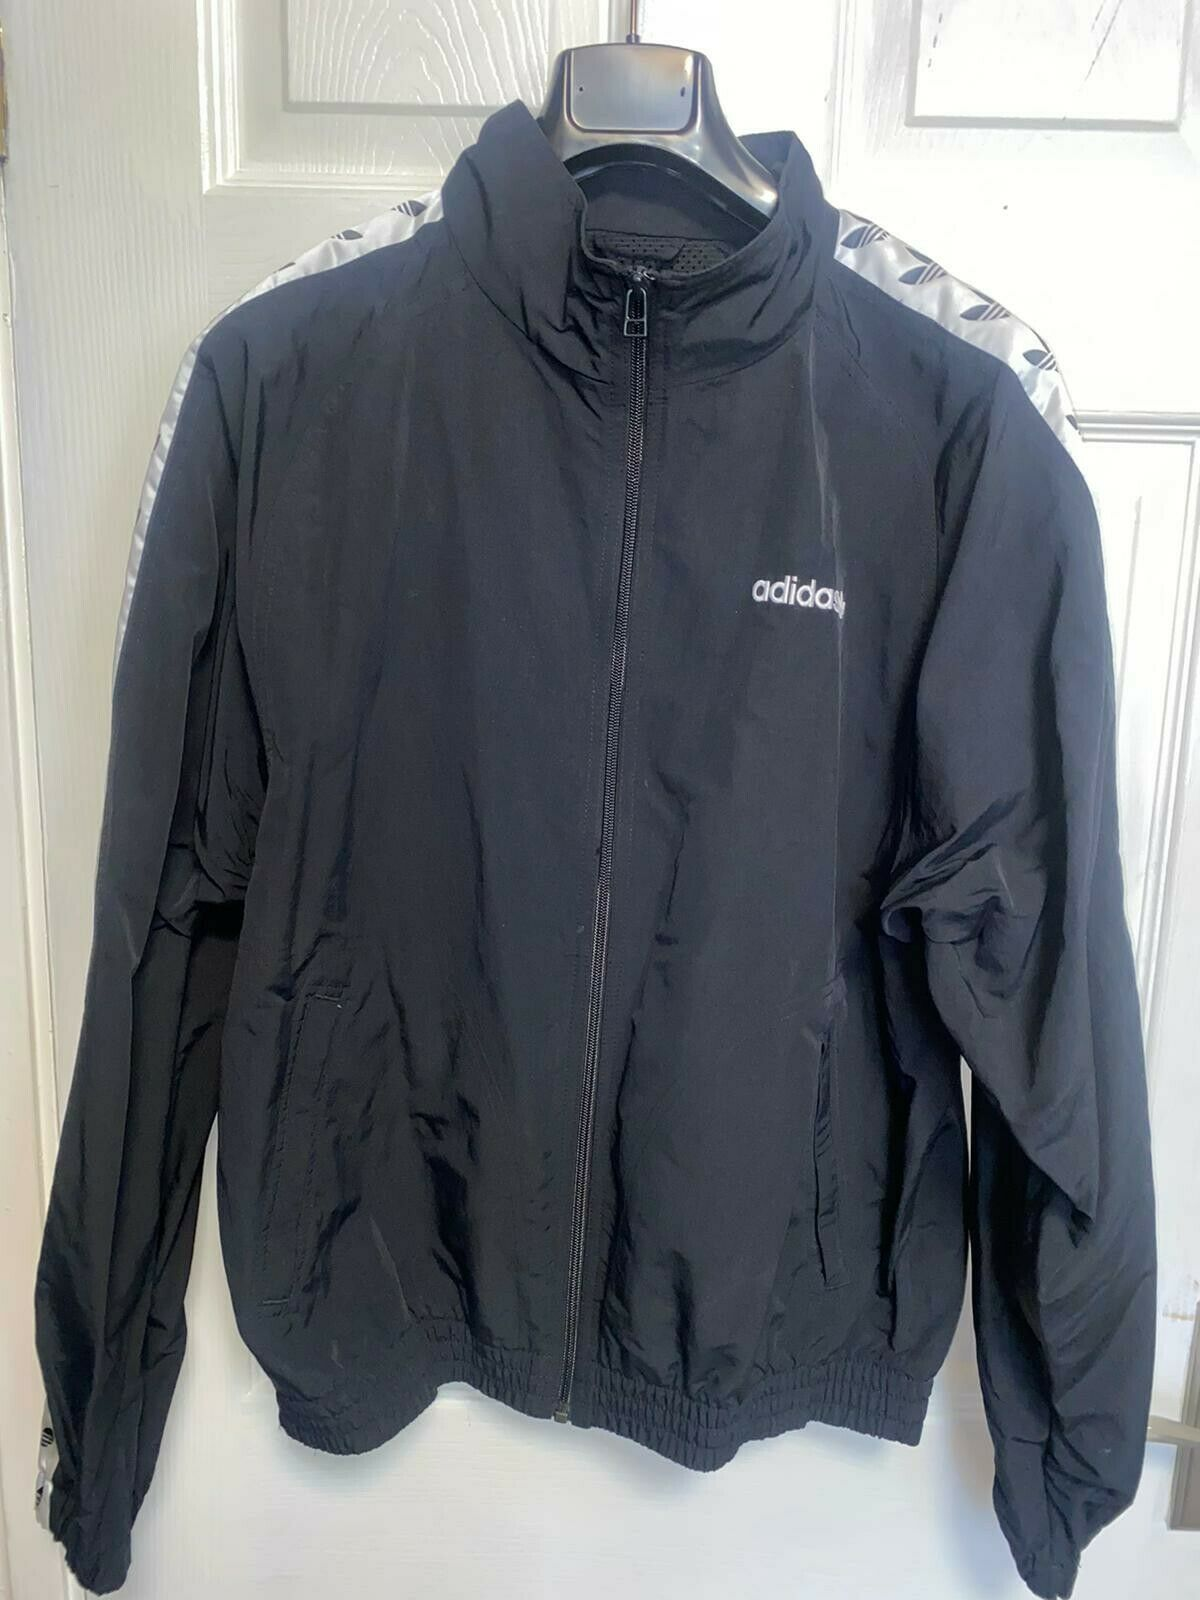 Adidas Orginals Windbreaker Track Jacket